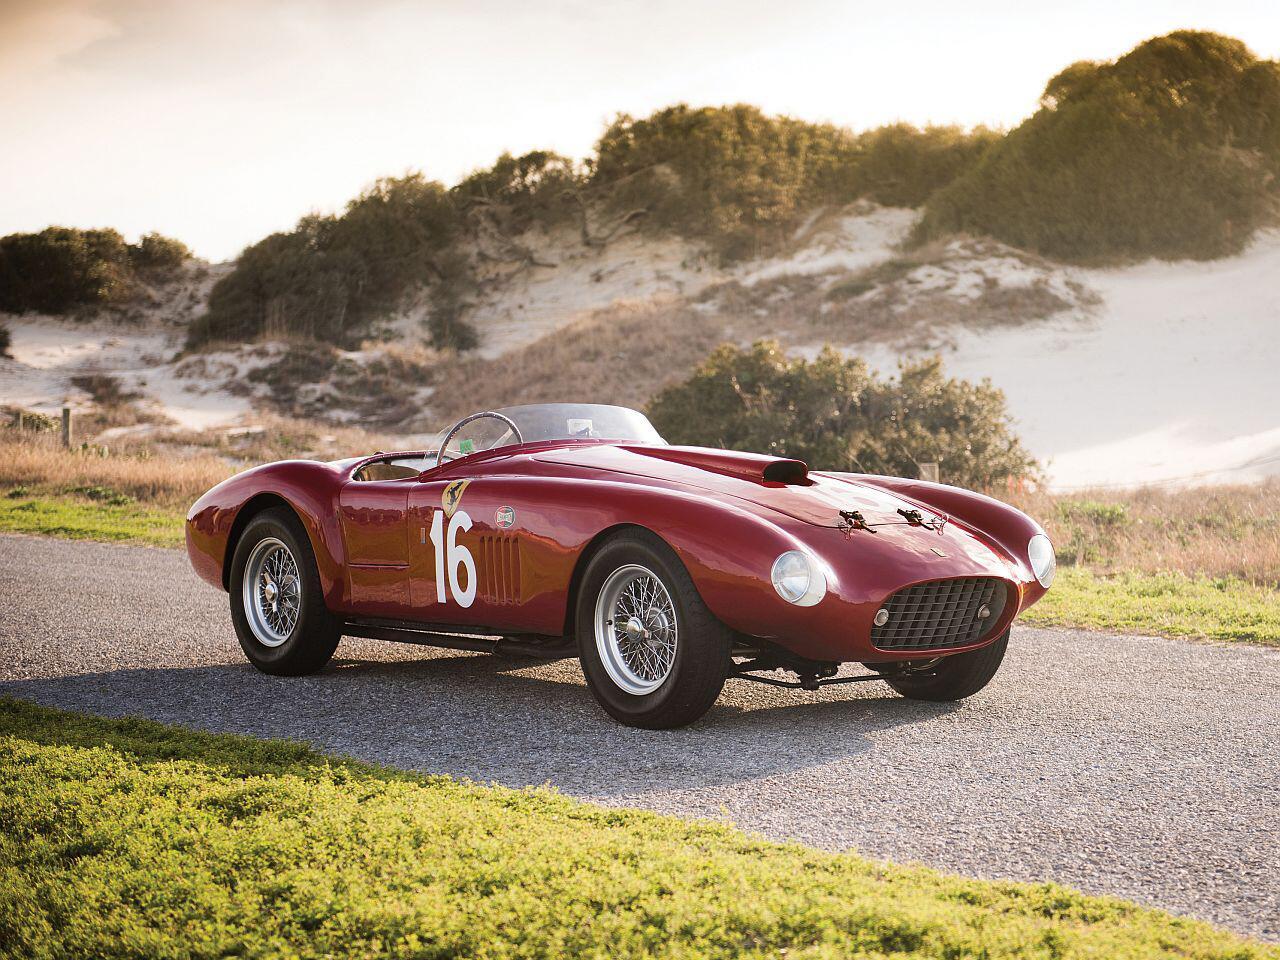 Bild zu 1950 Ferrari 275S 340 America Barchetta by Scaglietti